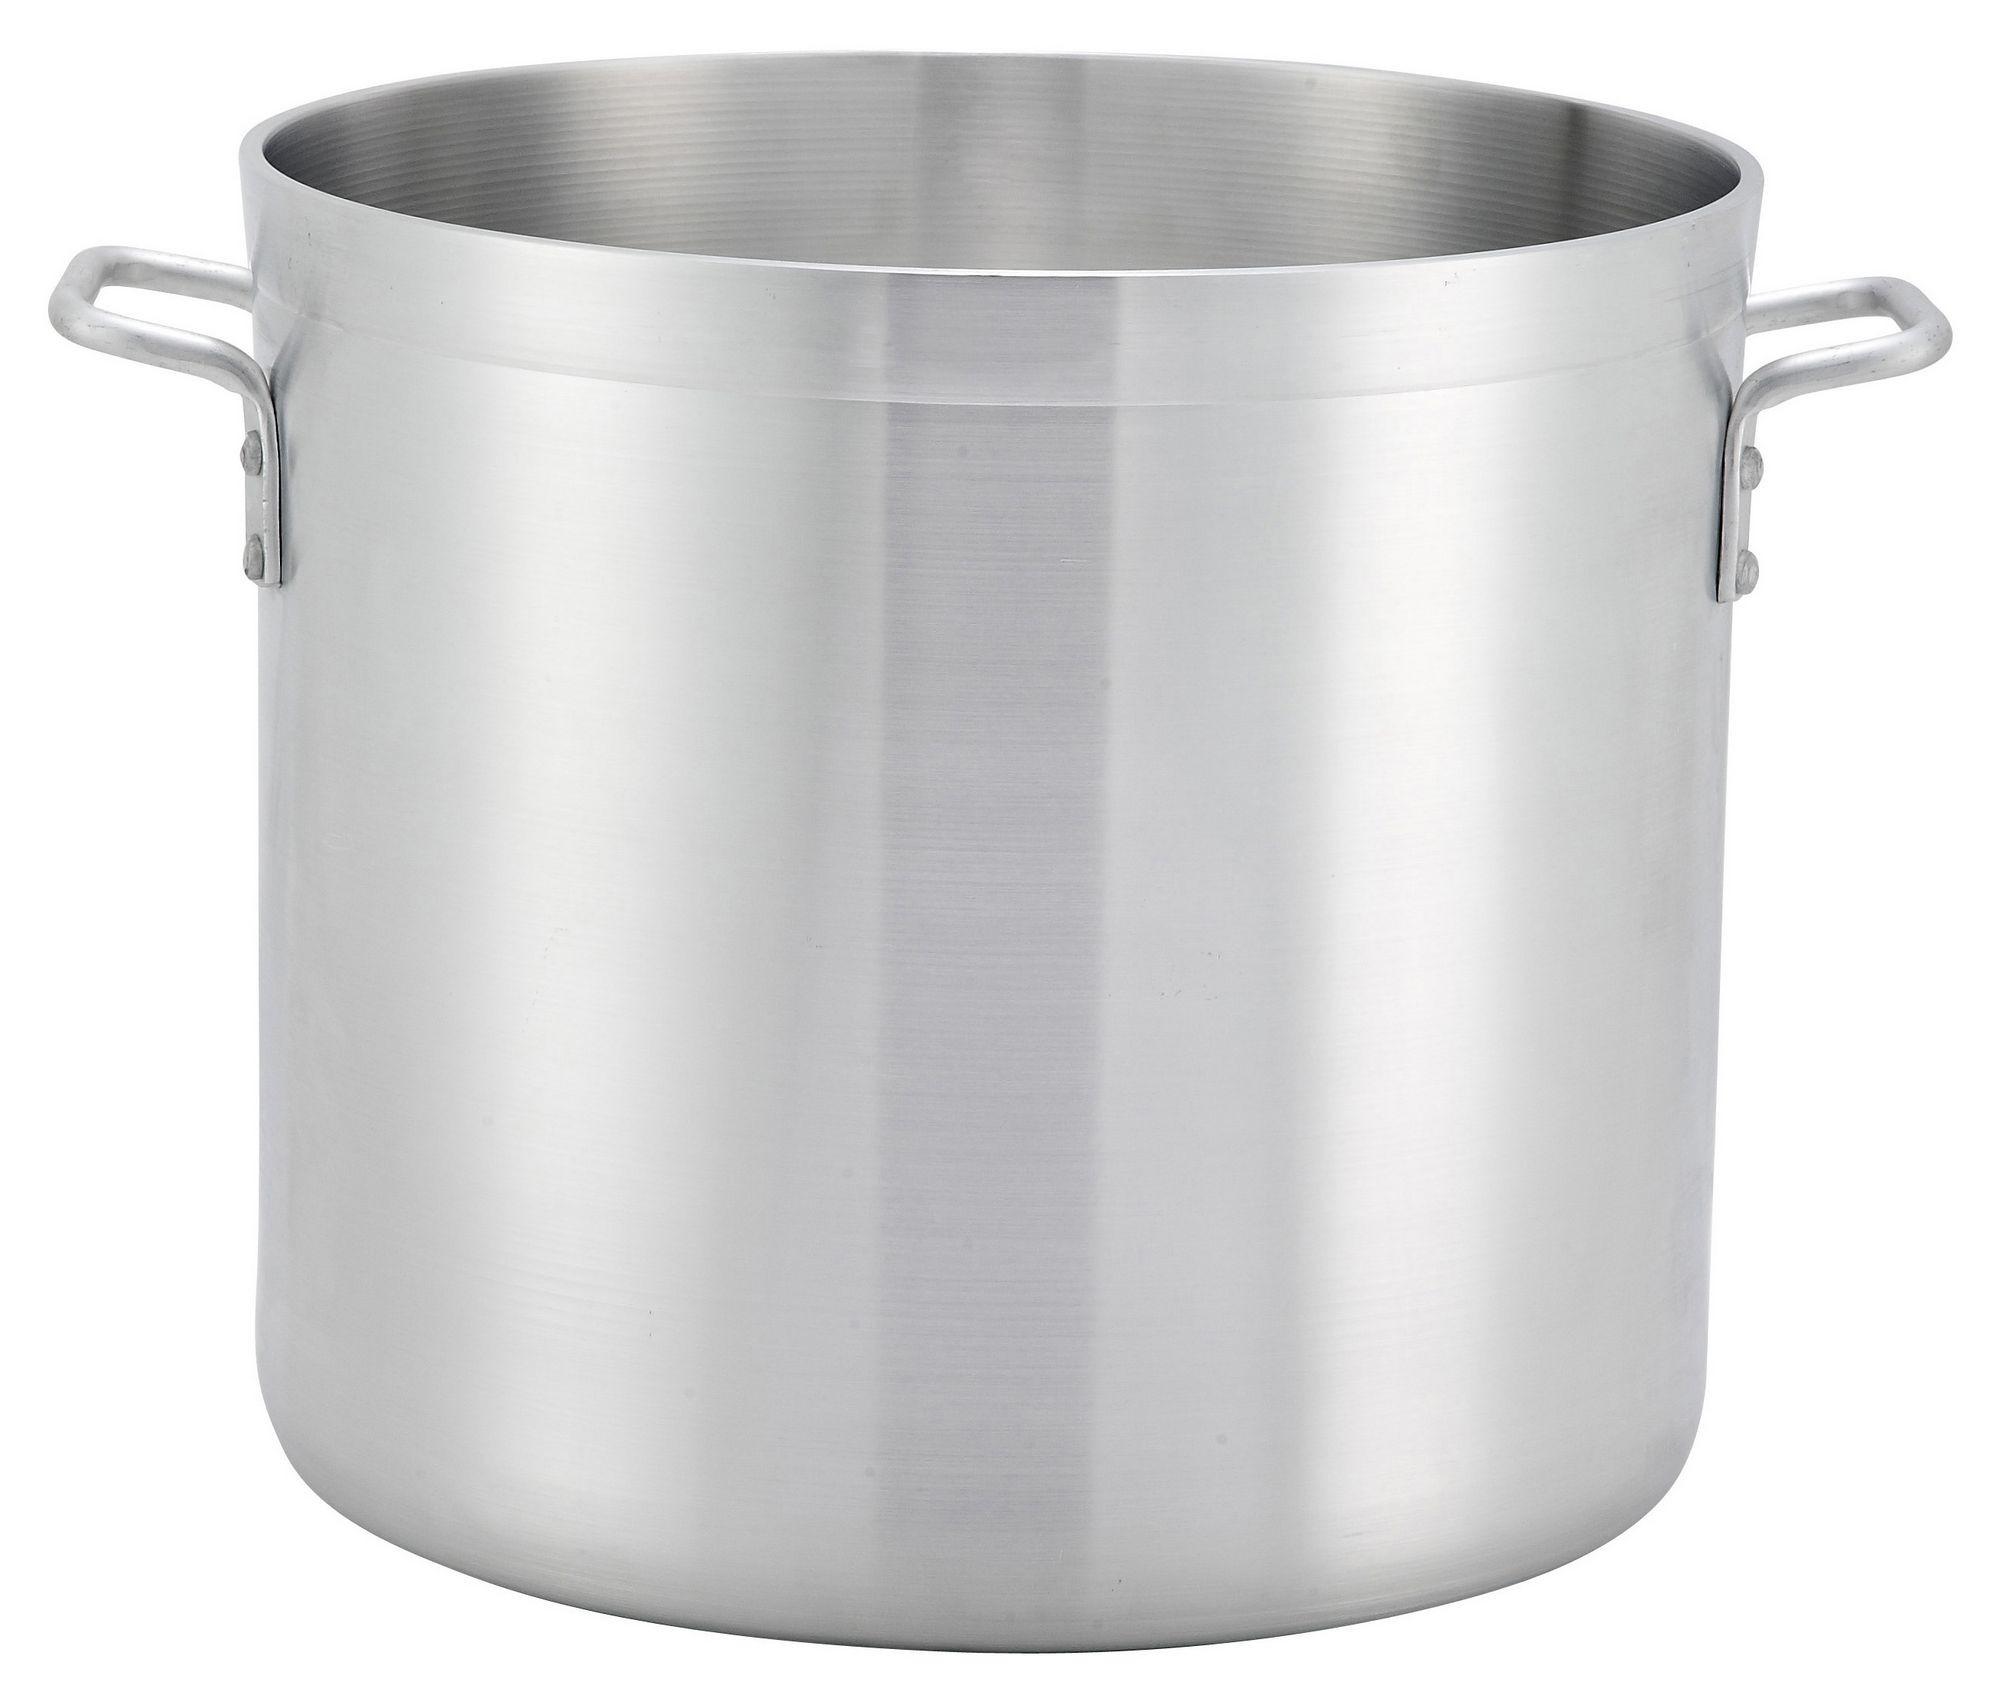 Winco ALHP-140 Precision Aluminum 140 Qt. Stock Pot